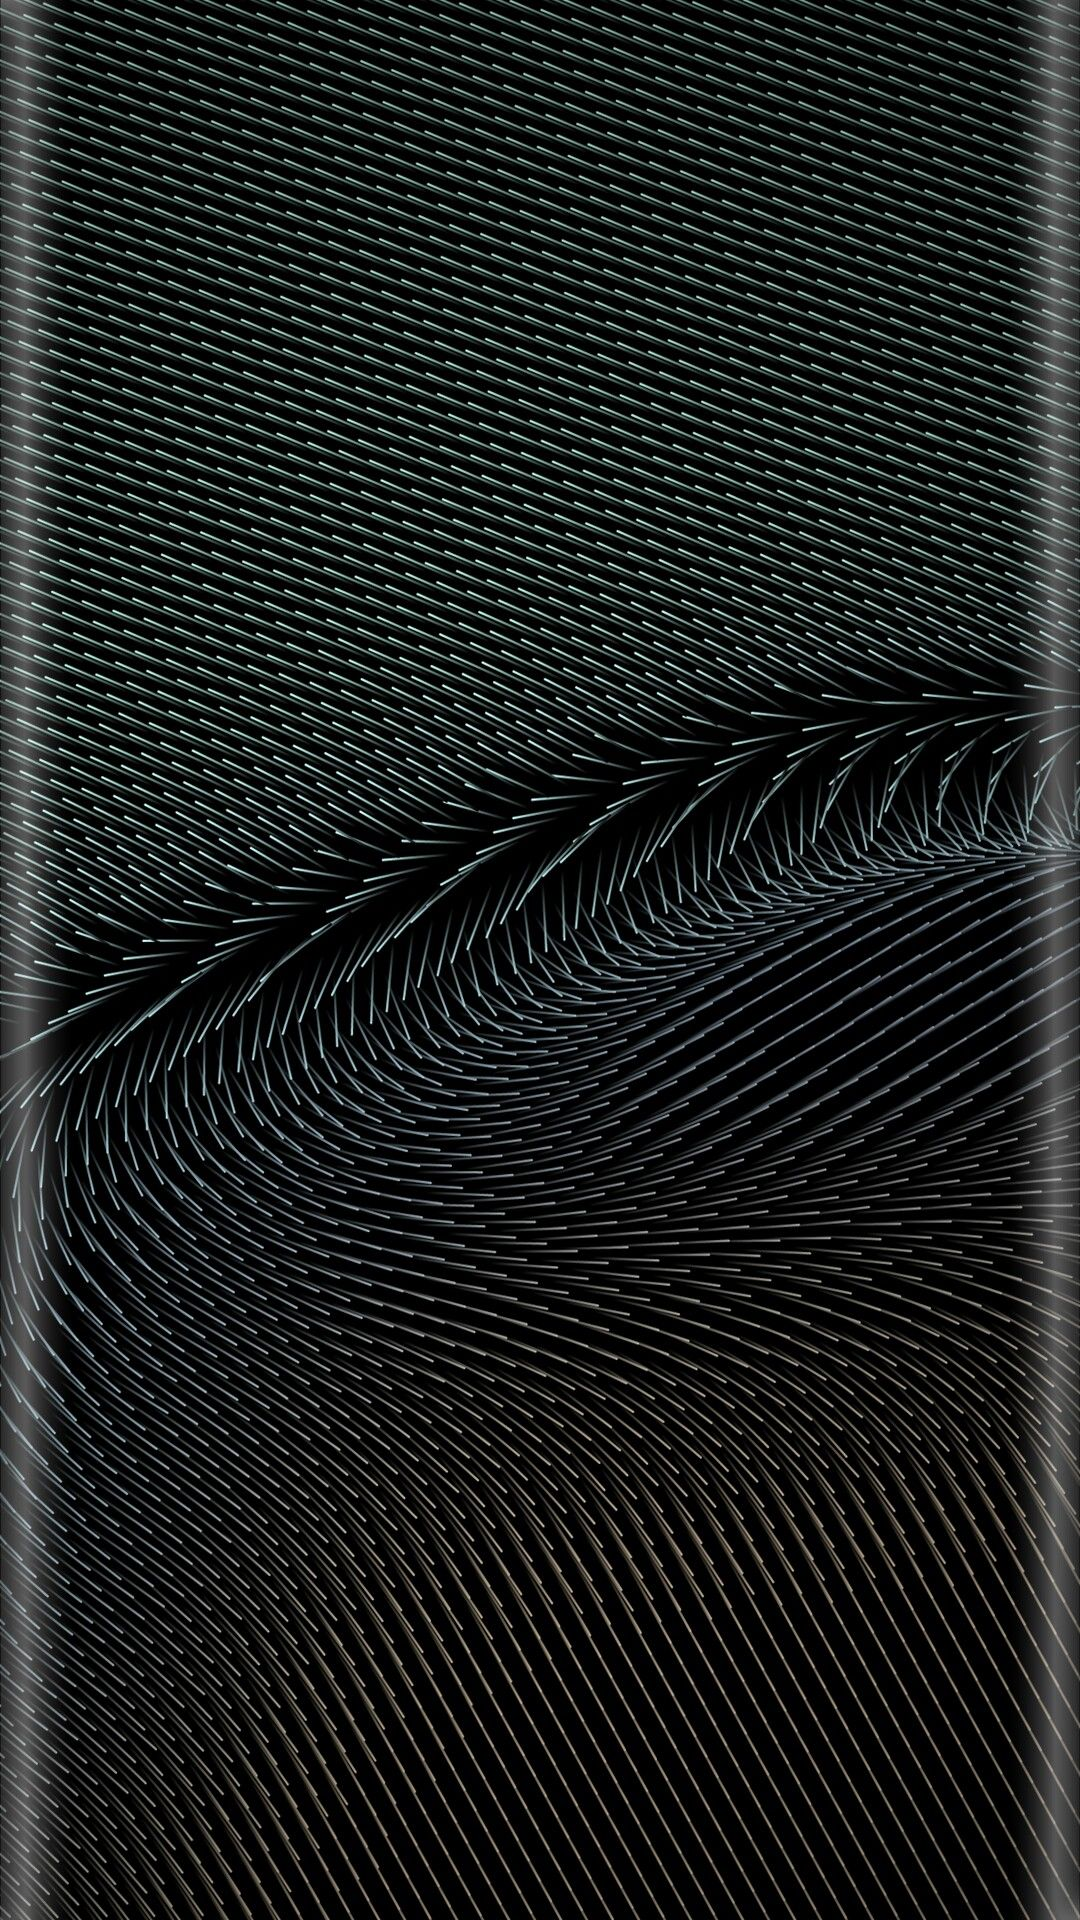 S Edge Wallpaper S Edge Samsung S Wallpaper Iphone Background Wallpaper Apple Wallpaper